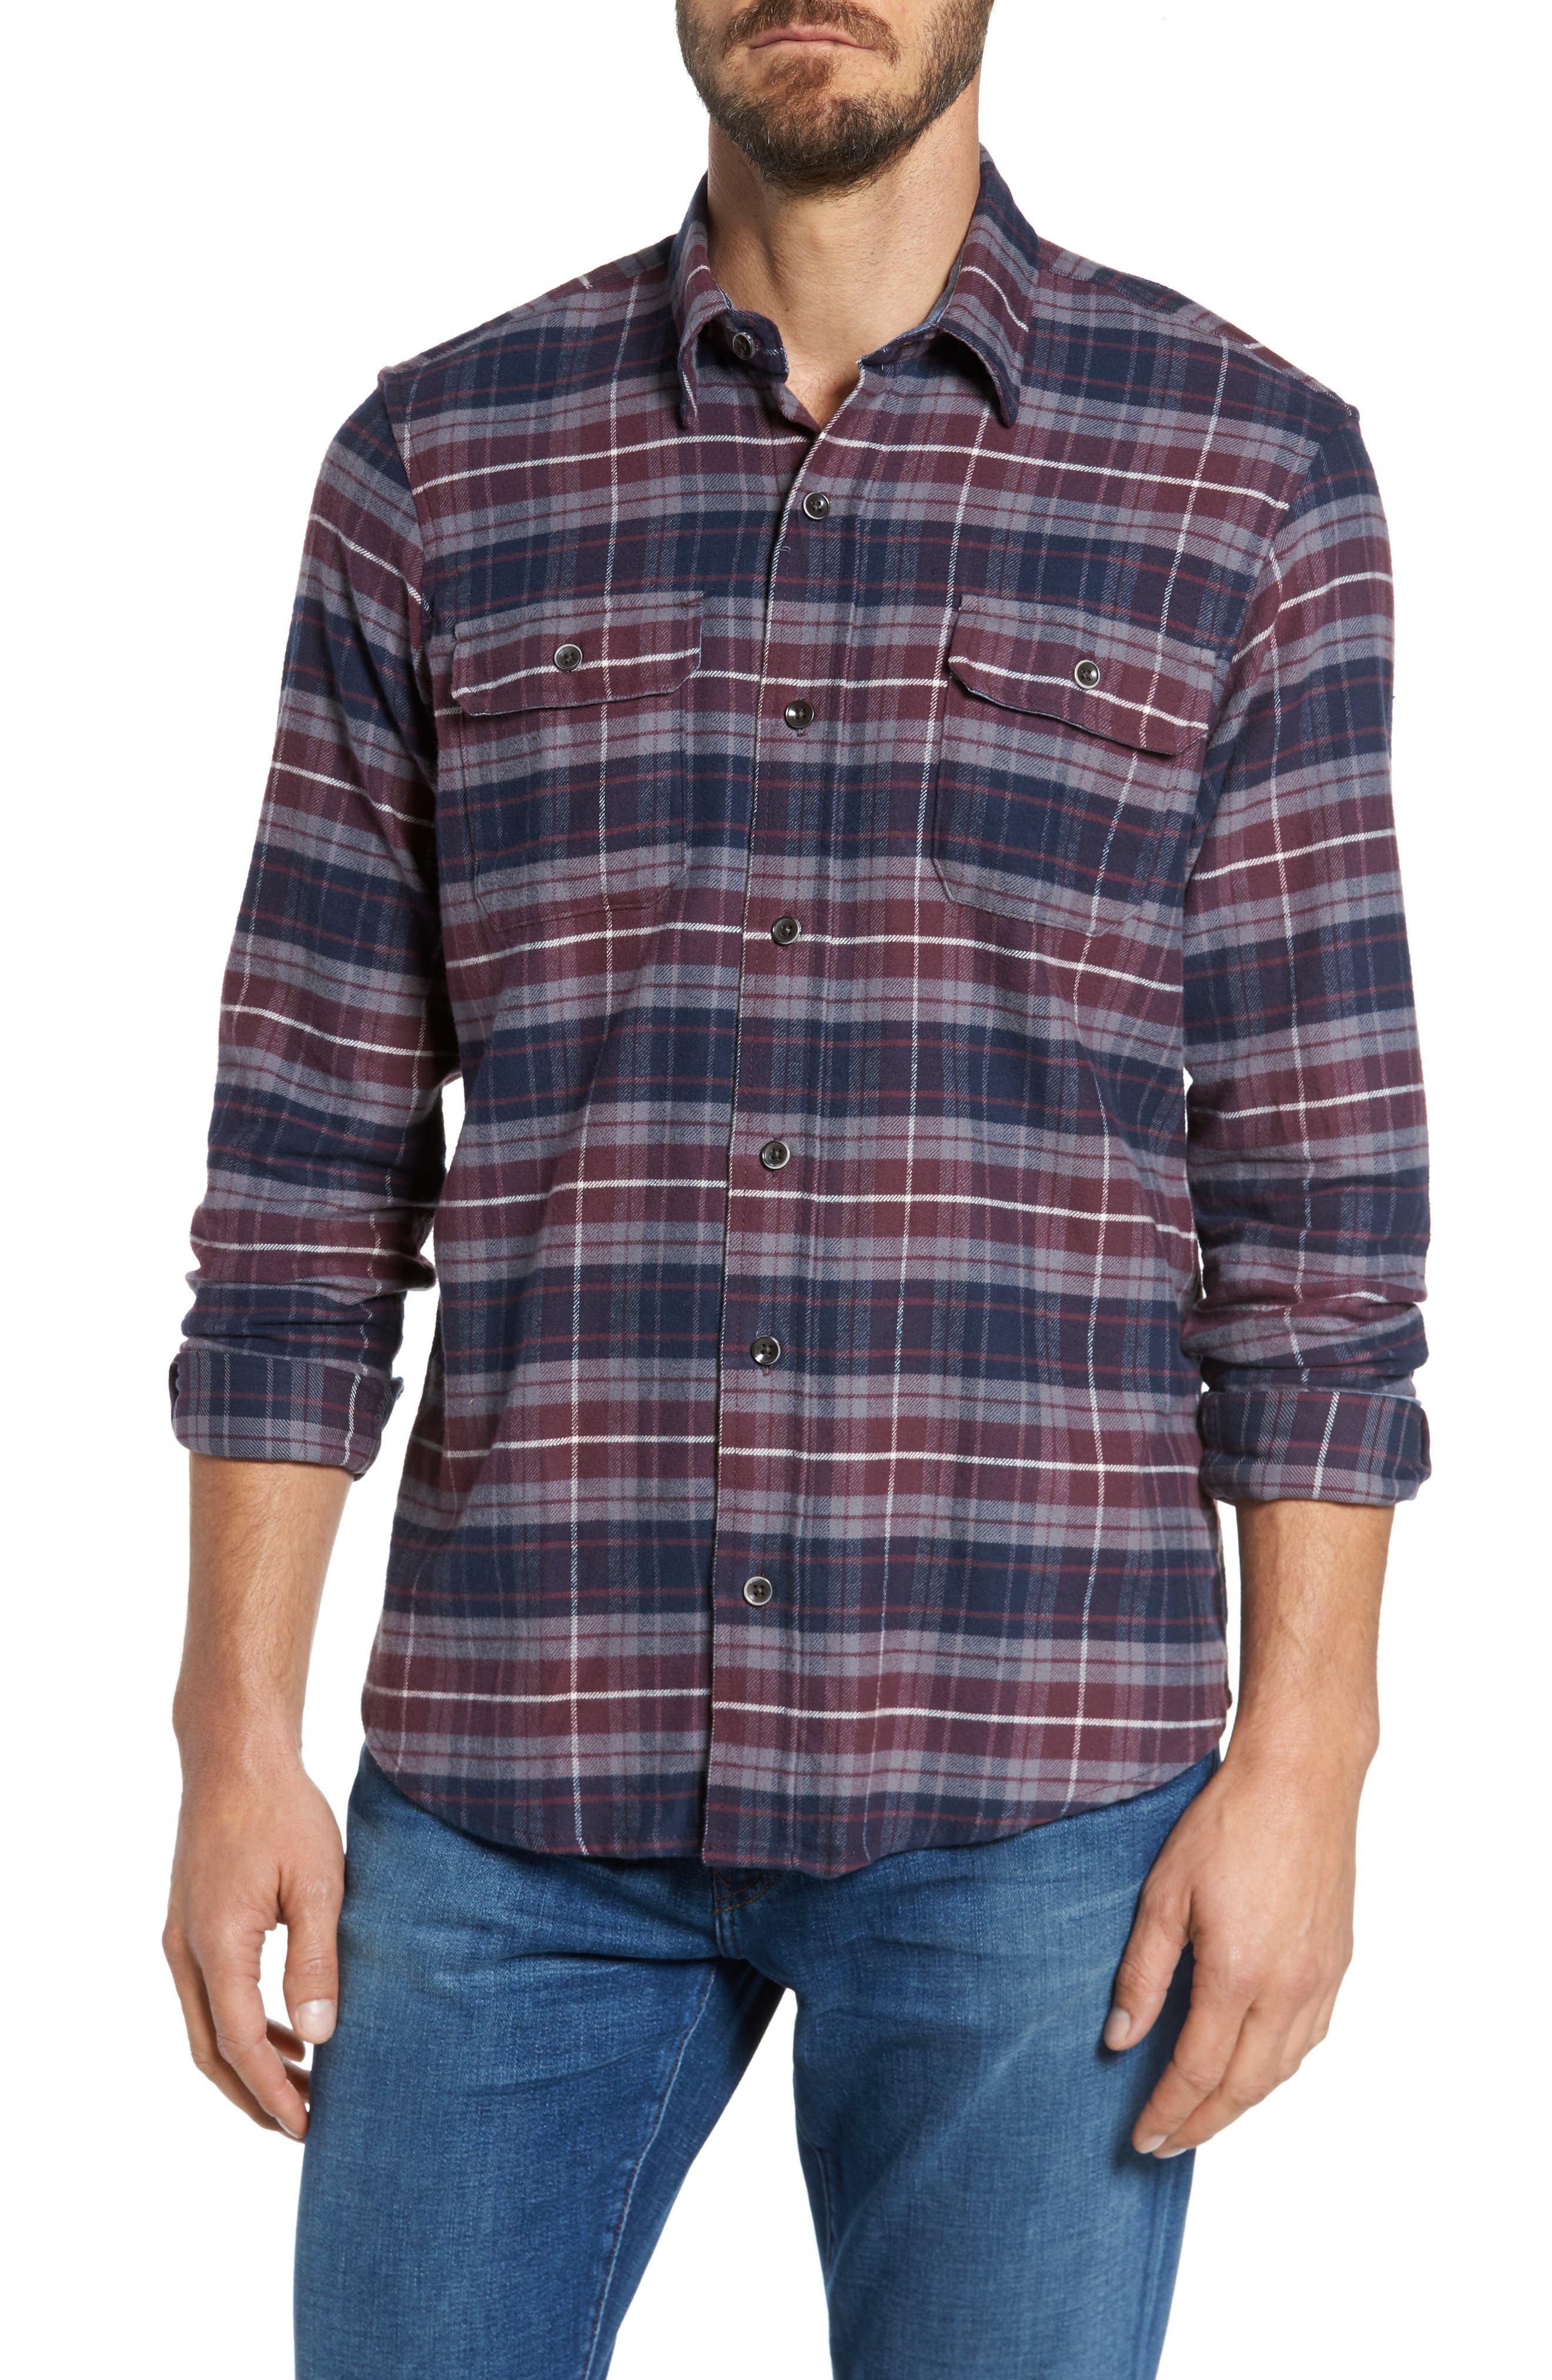 Alternate Image 1 Selected - Tailor Vintage Plaid Flannel Sport Shirt